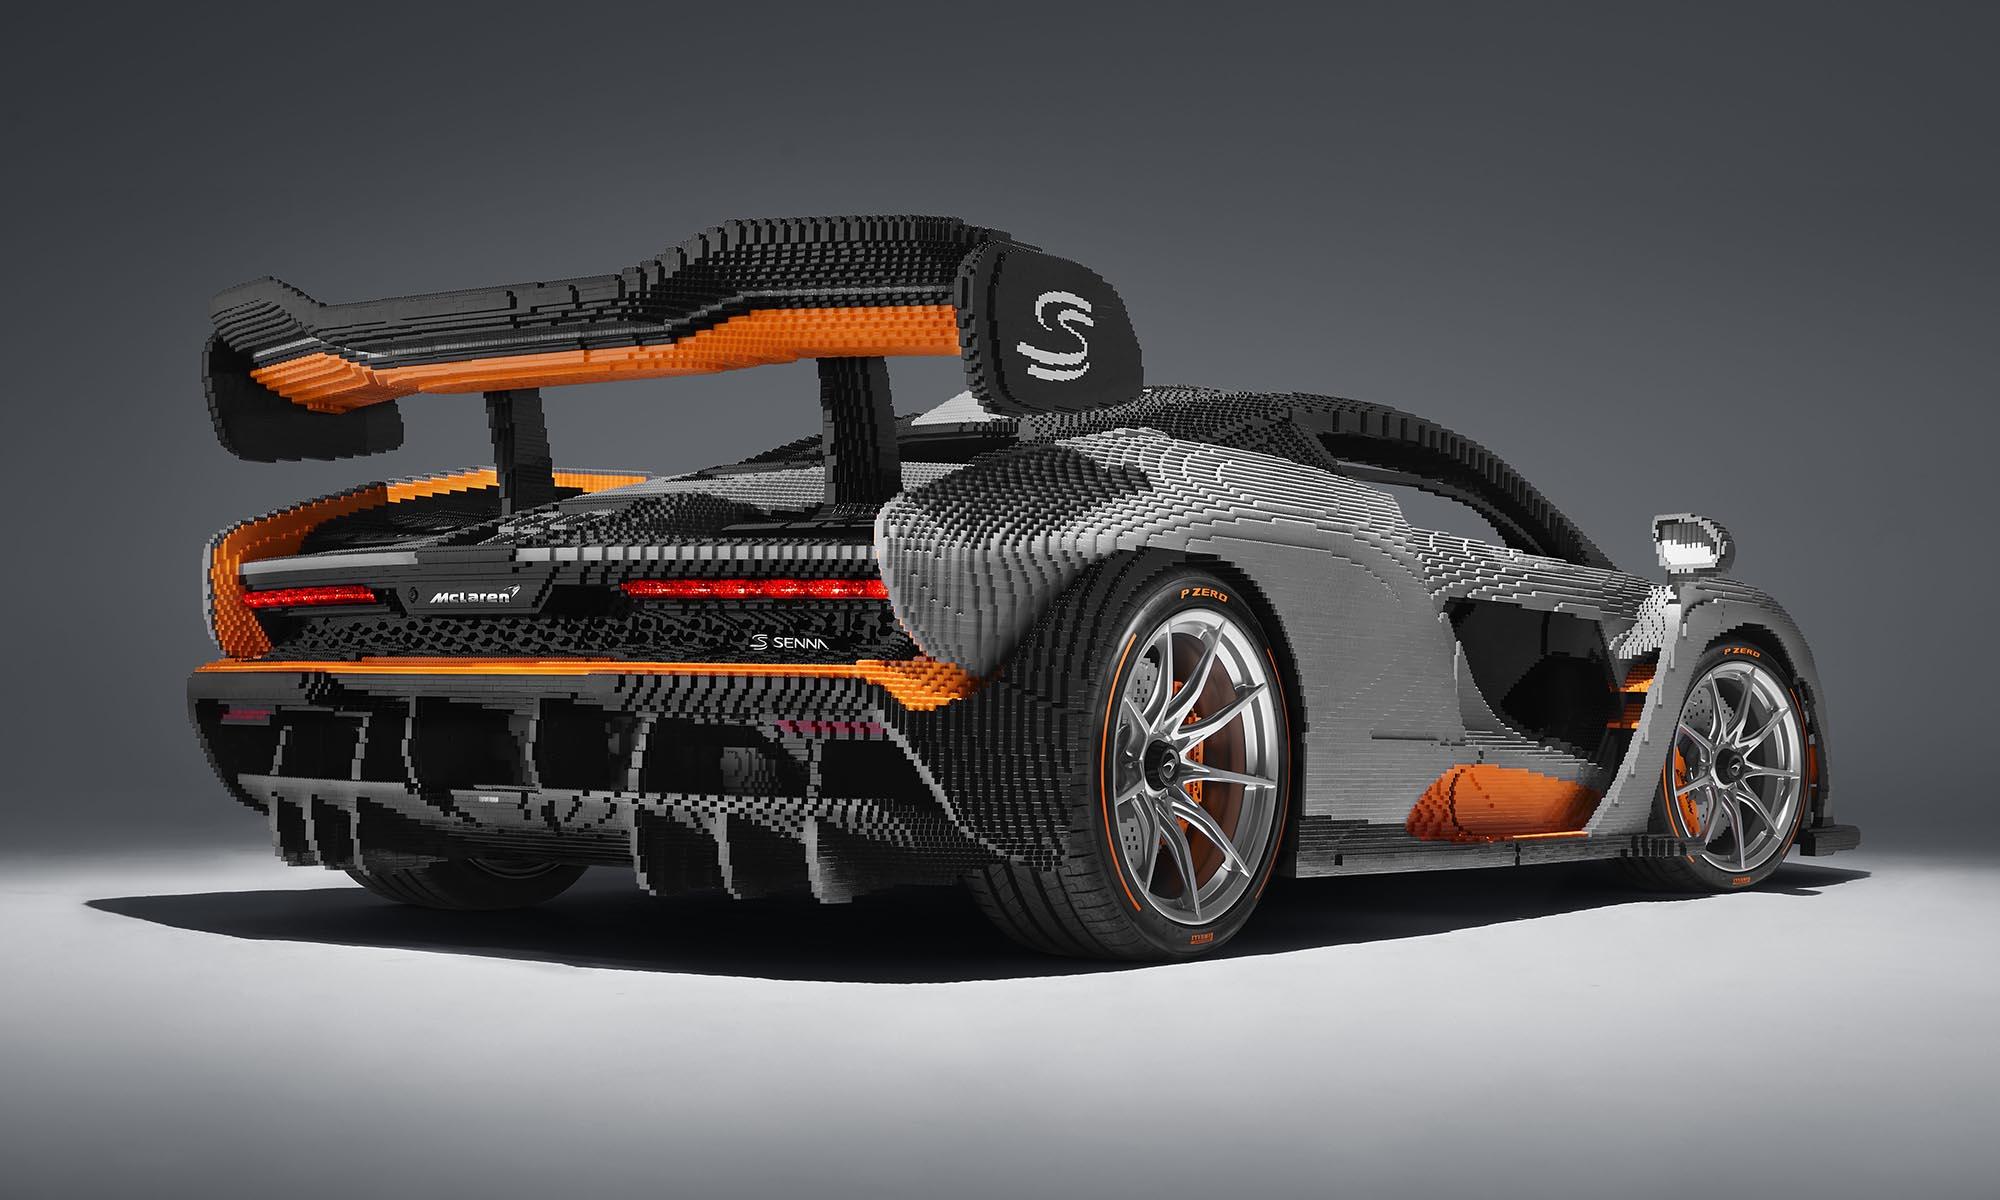 McLaren, Senna, car, auto, automotive, vehicle, luxury, highlife, lego, lego technic